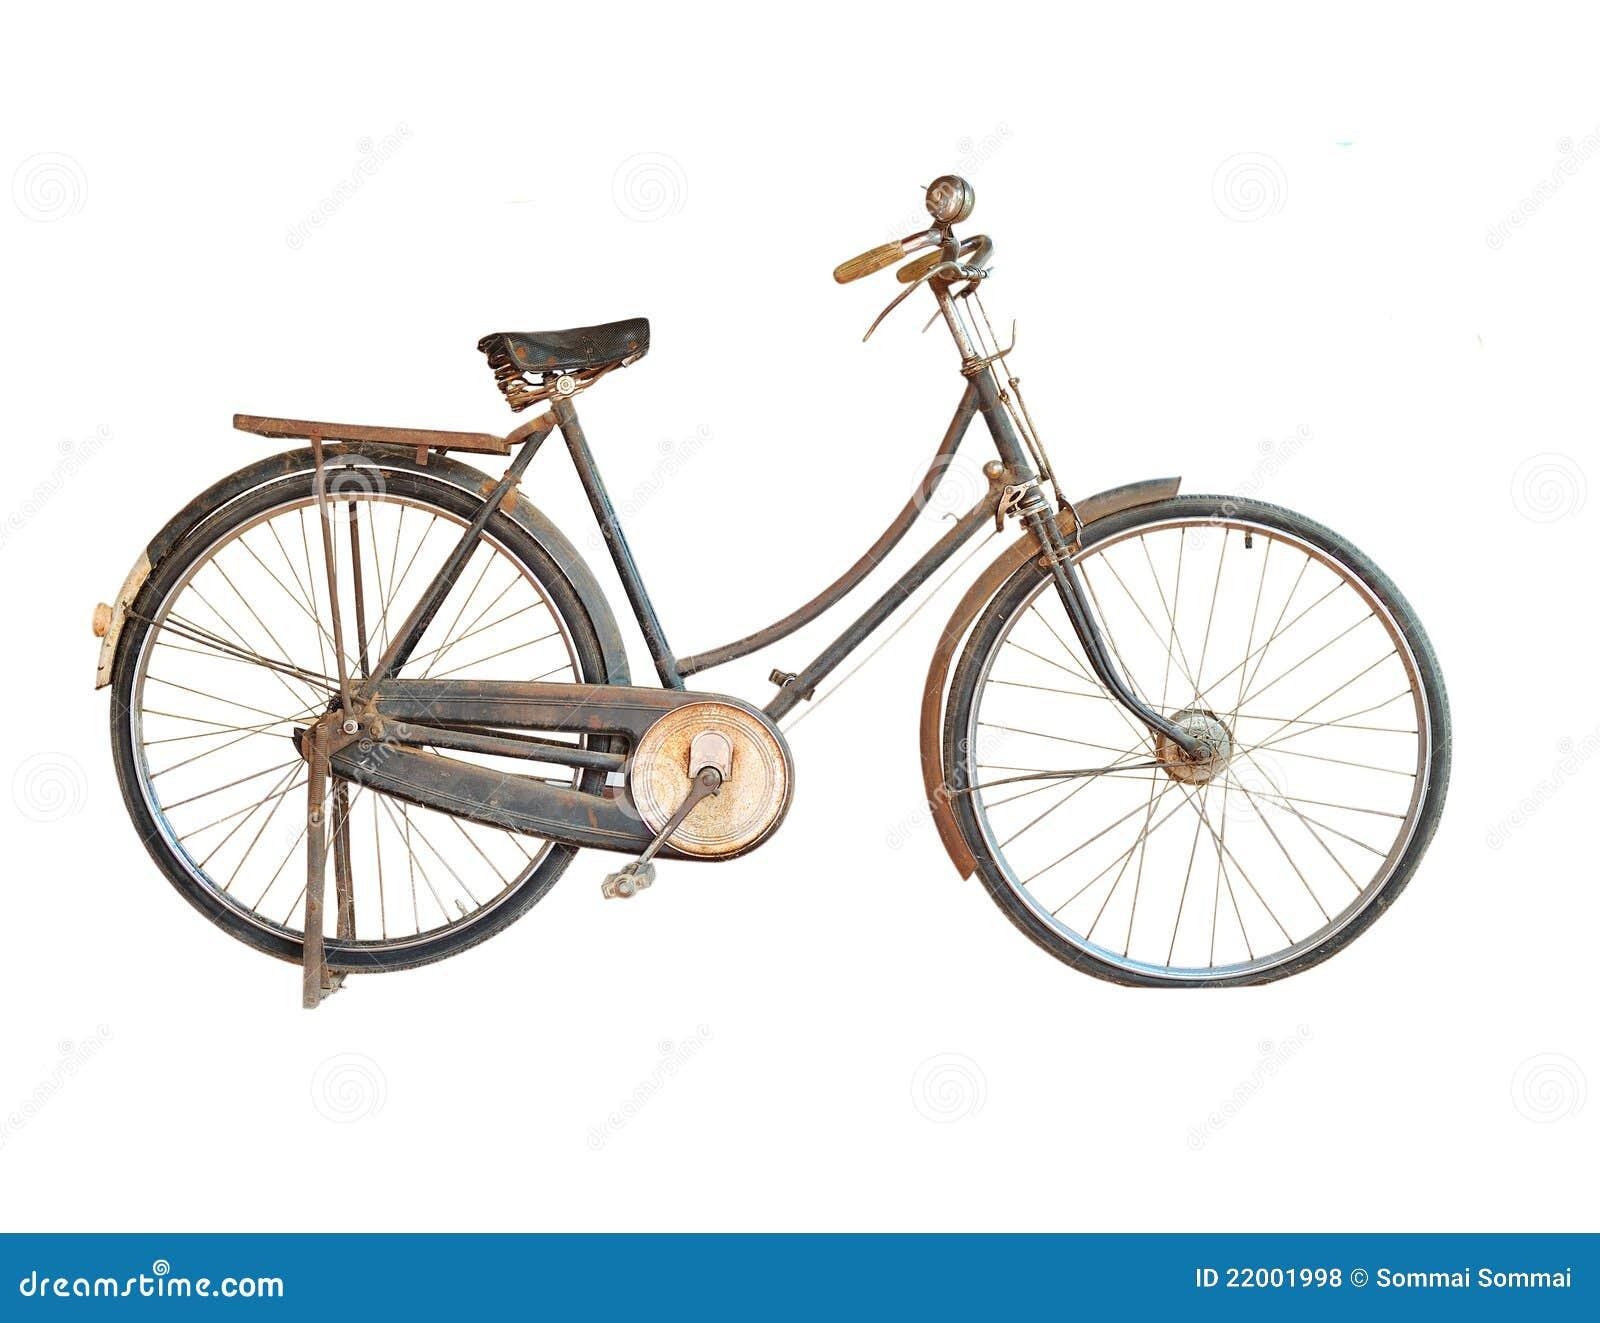 bicicleta antiga fotos de stock royalty free imagem icicle clip art free icicle image clipart